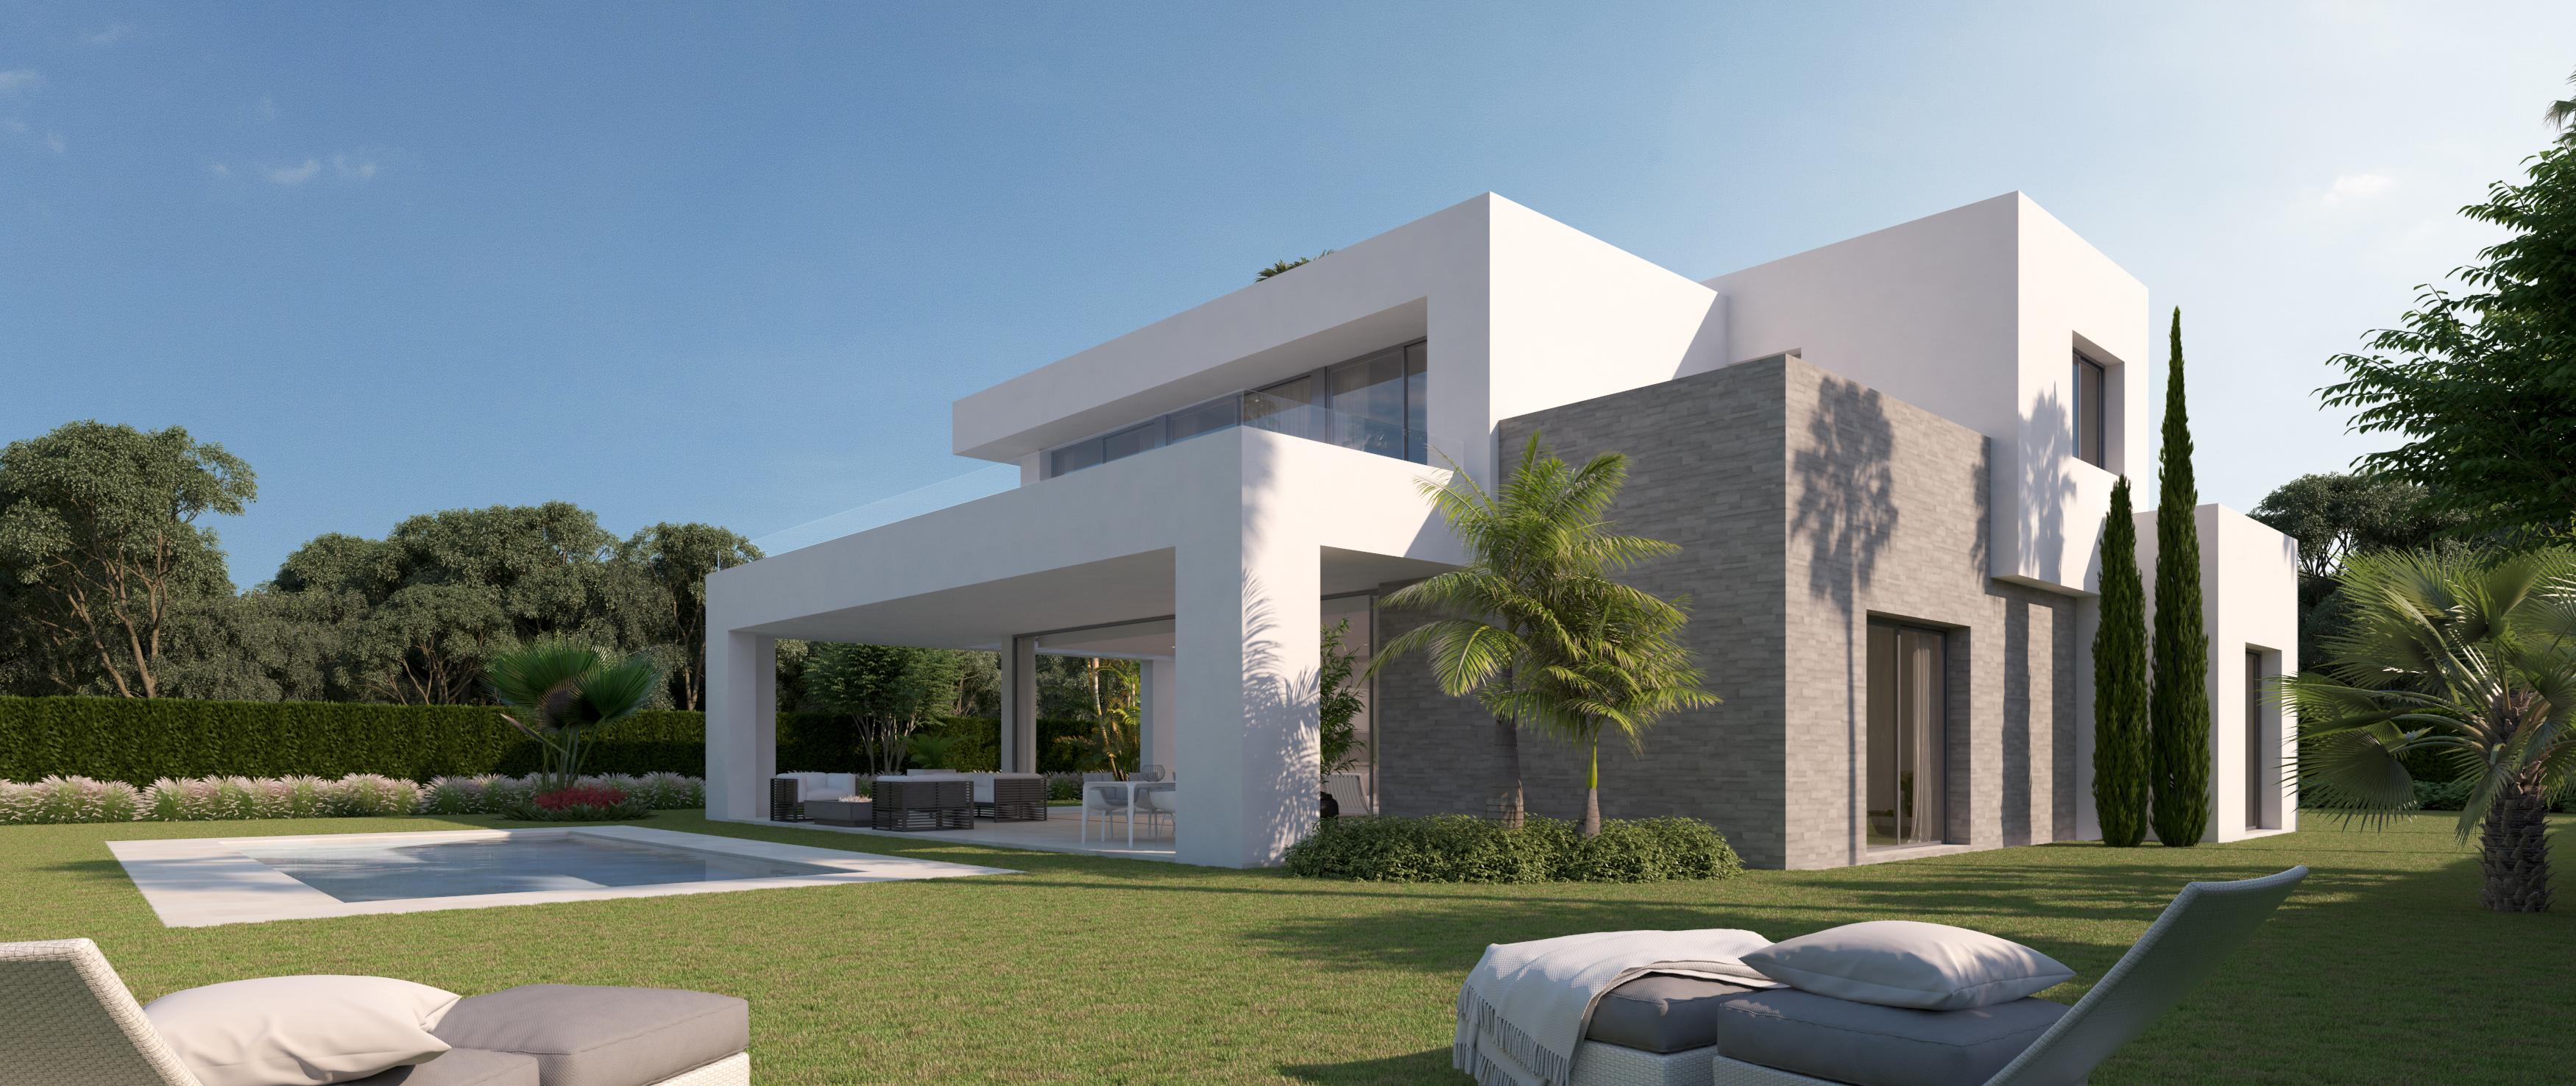 210-03-haus-kaufen-costa-del-sol-moderne-villa